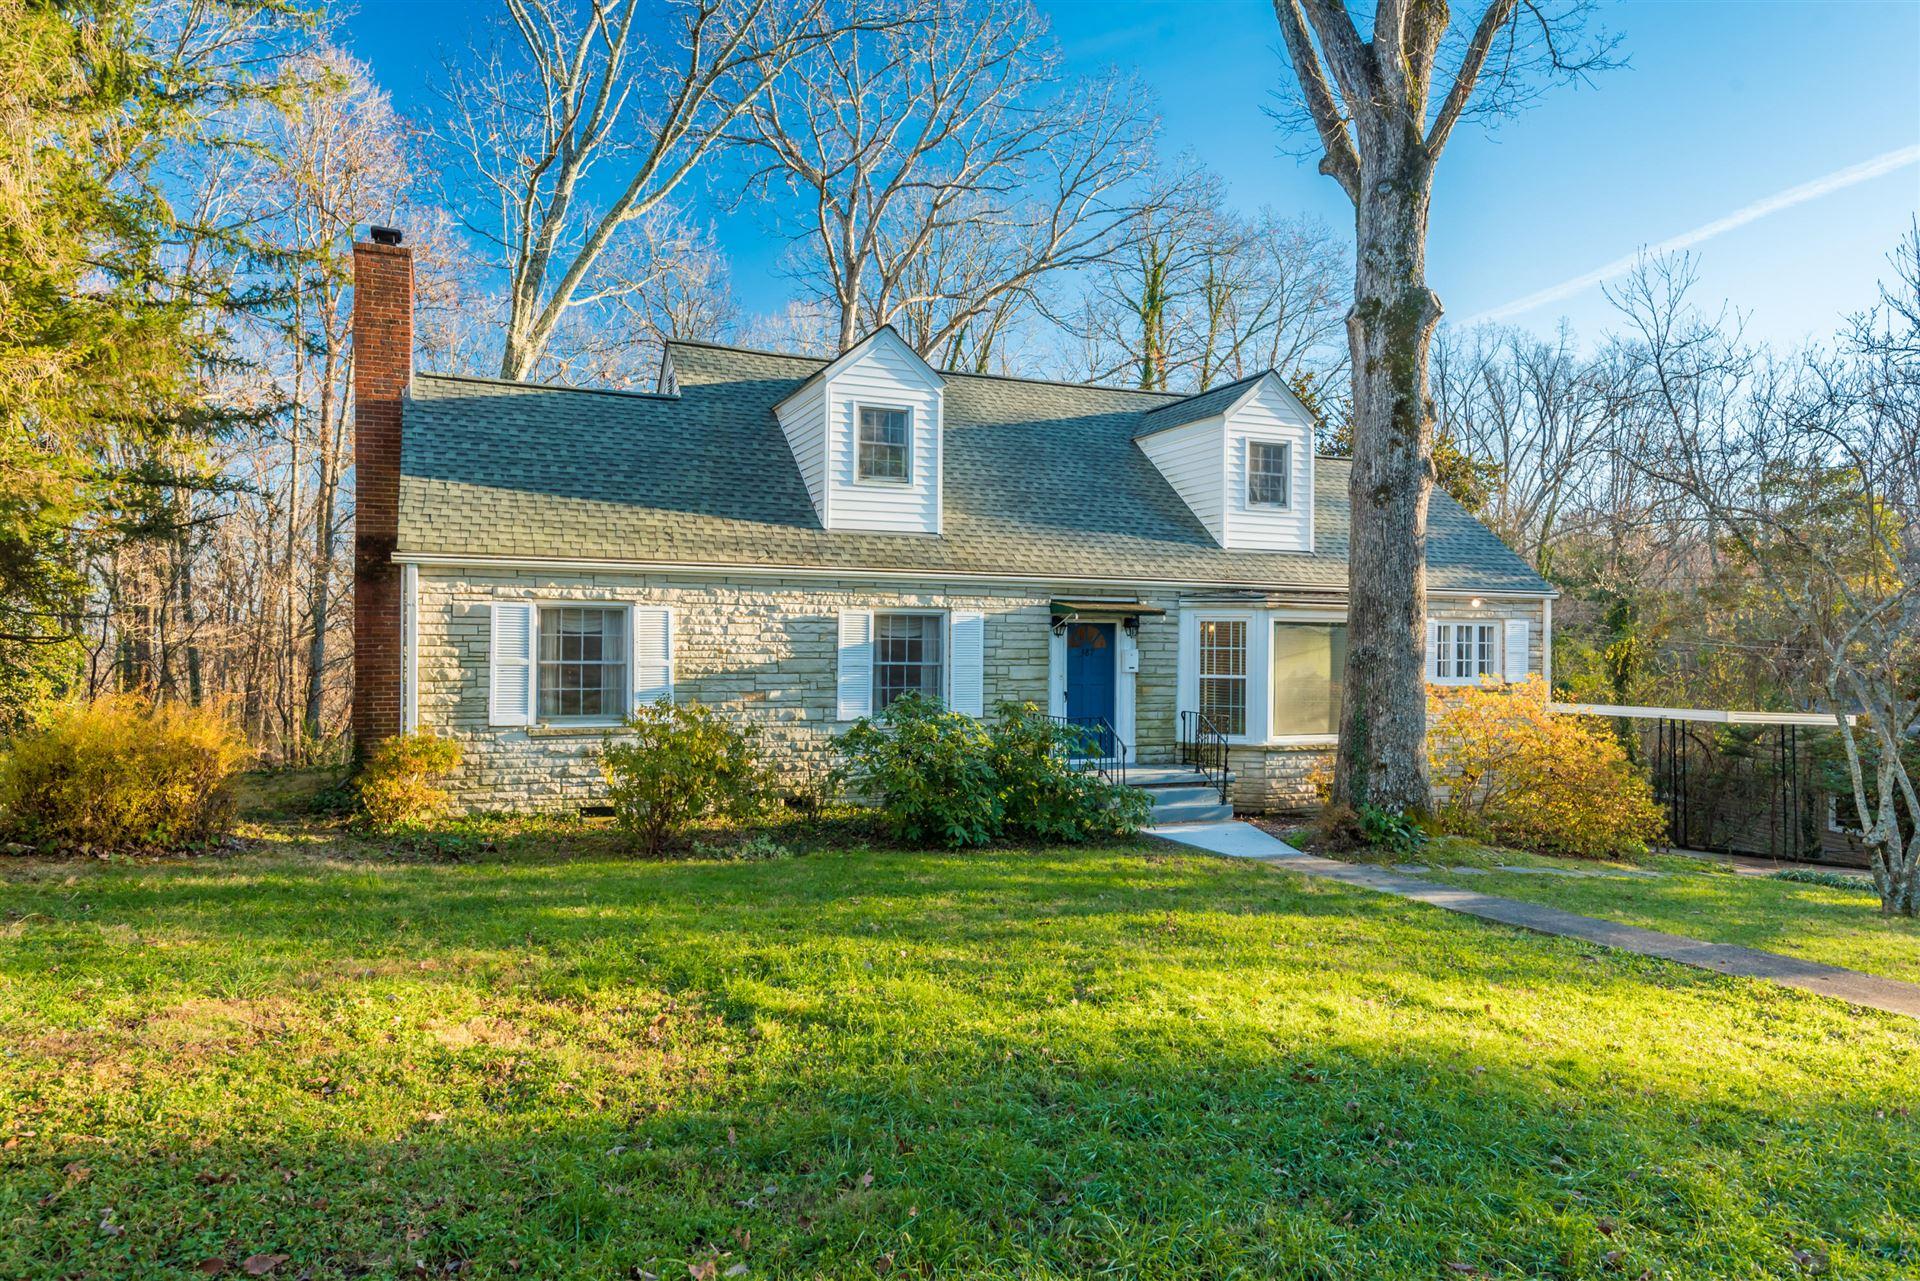 Photo of 387 East Drive, Oak Ridge, TN 37830 (MLS # 1138422)